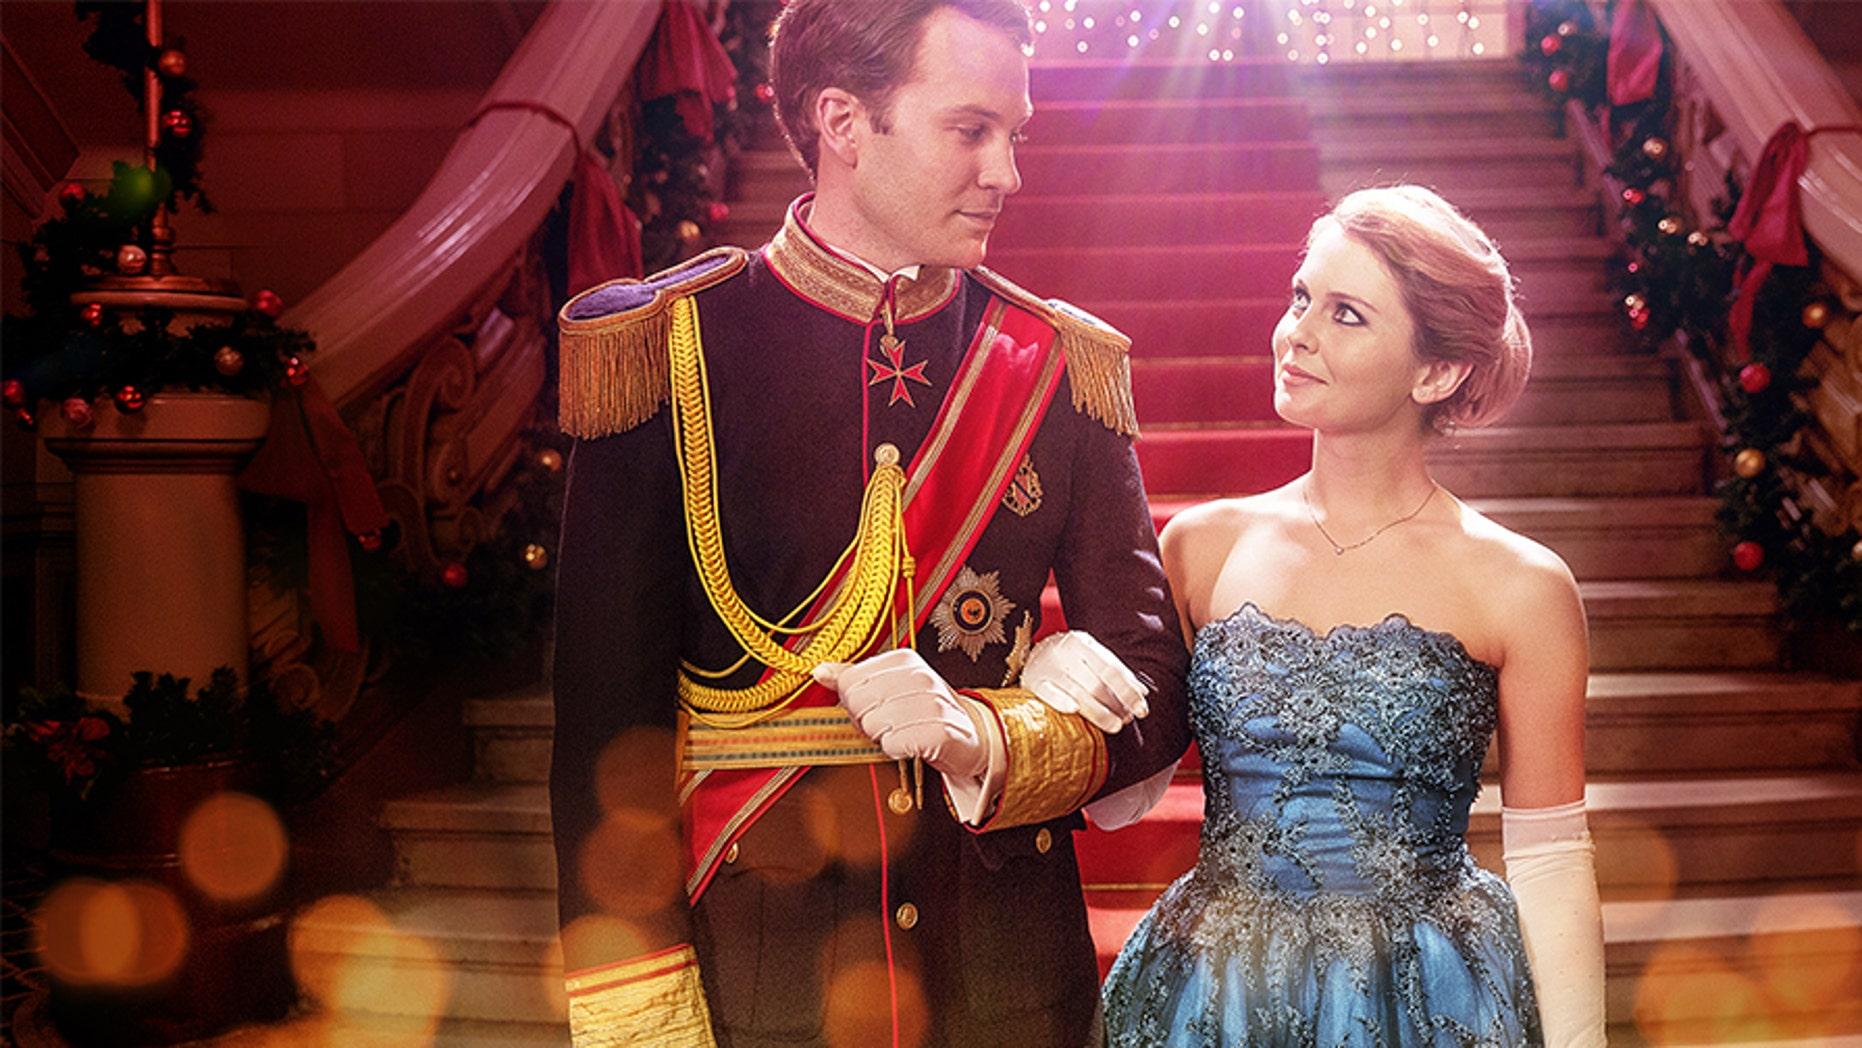 """A Christmas Prince"" stars Ben Lamb and Rose McIver as Prince Richard and Amber."